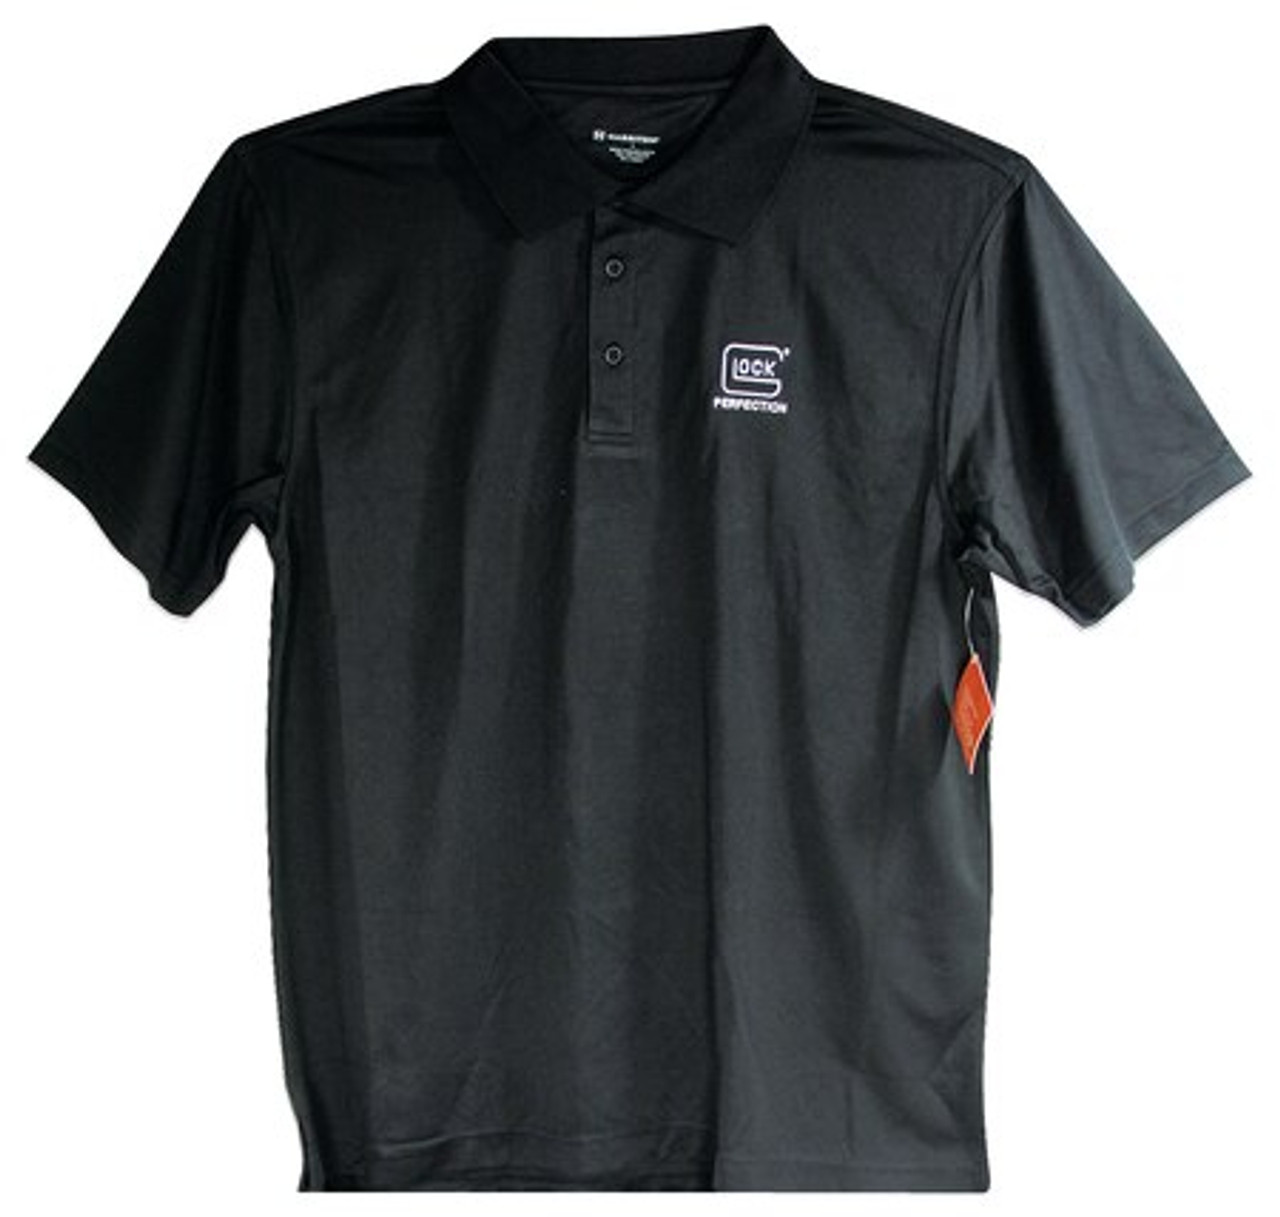 2XL STI International USA Arms Logo STACCATO Pistol POCKET SIDE Black T-Shirt S